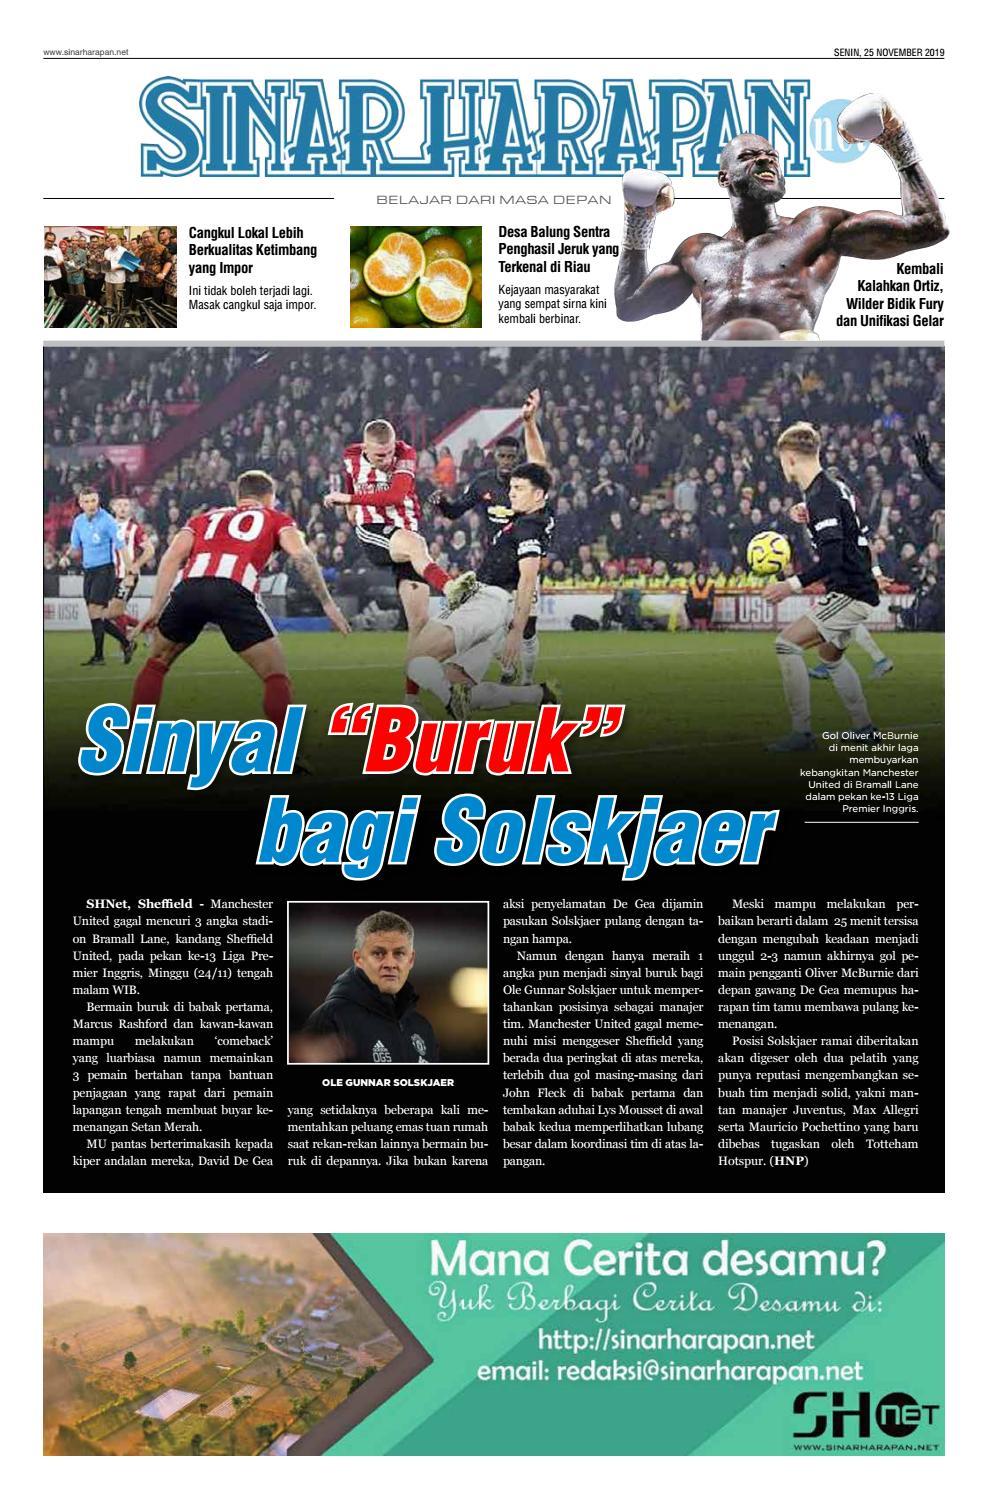 SINARHARAPANNET Daily 25 NOV 19 By Sinarharapannet Issuu